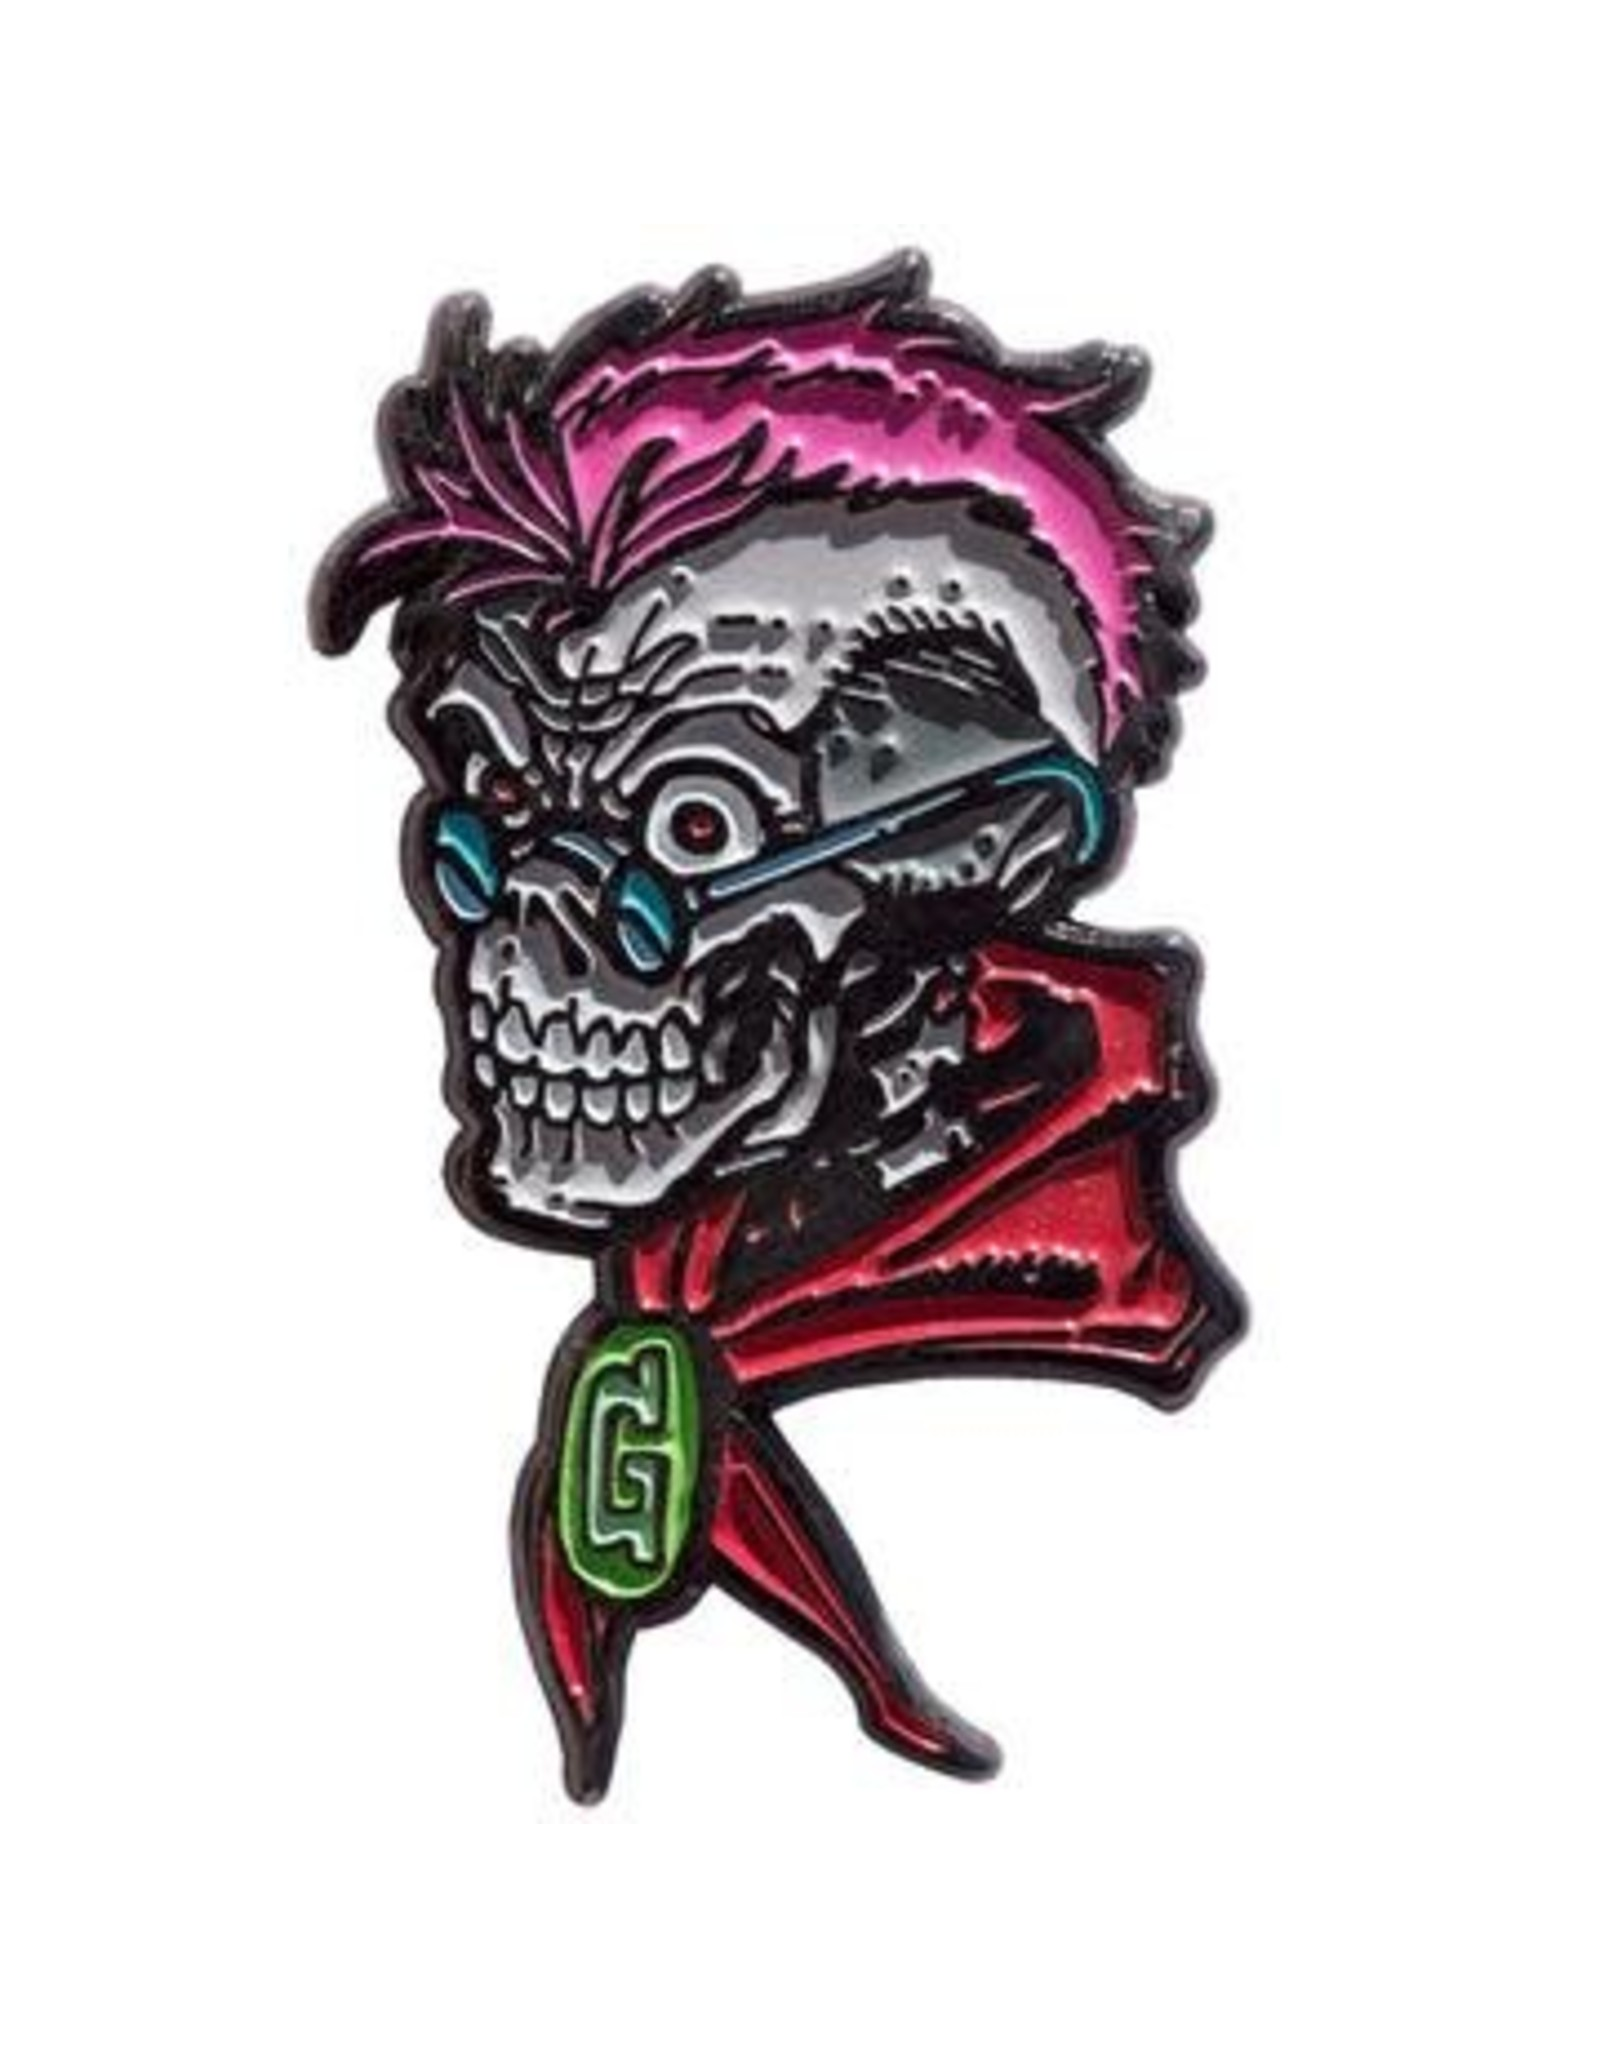 KREEPSVILLE 666 - Goosebumps Curly Skull Enamel Pin